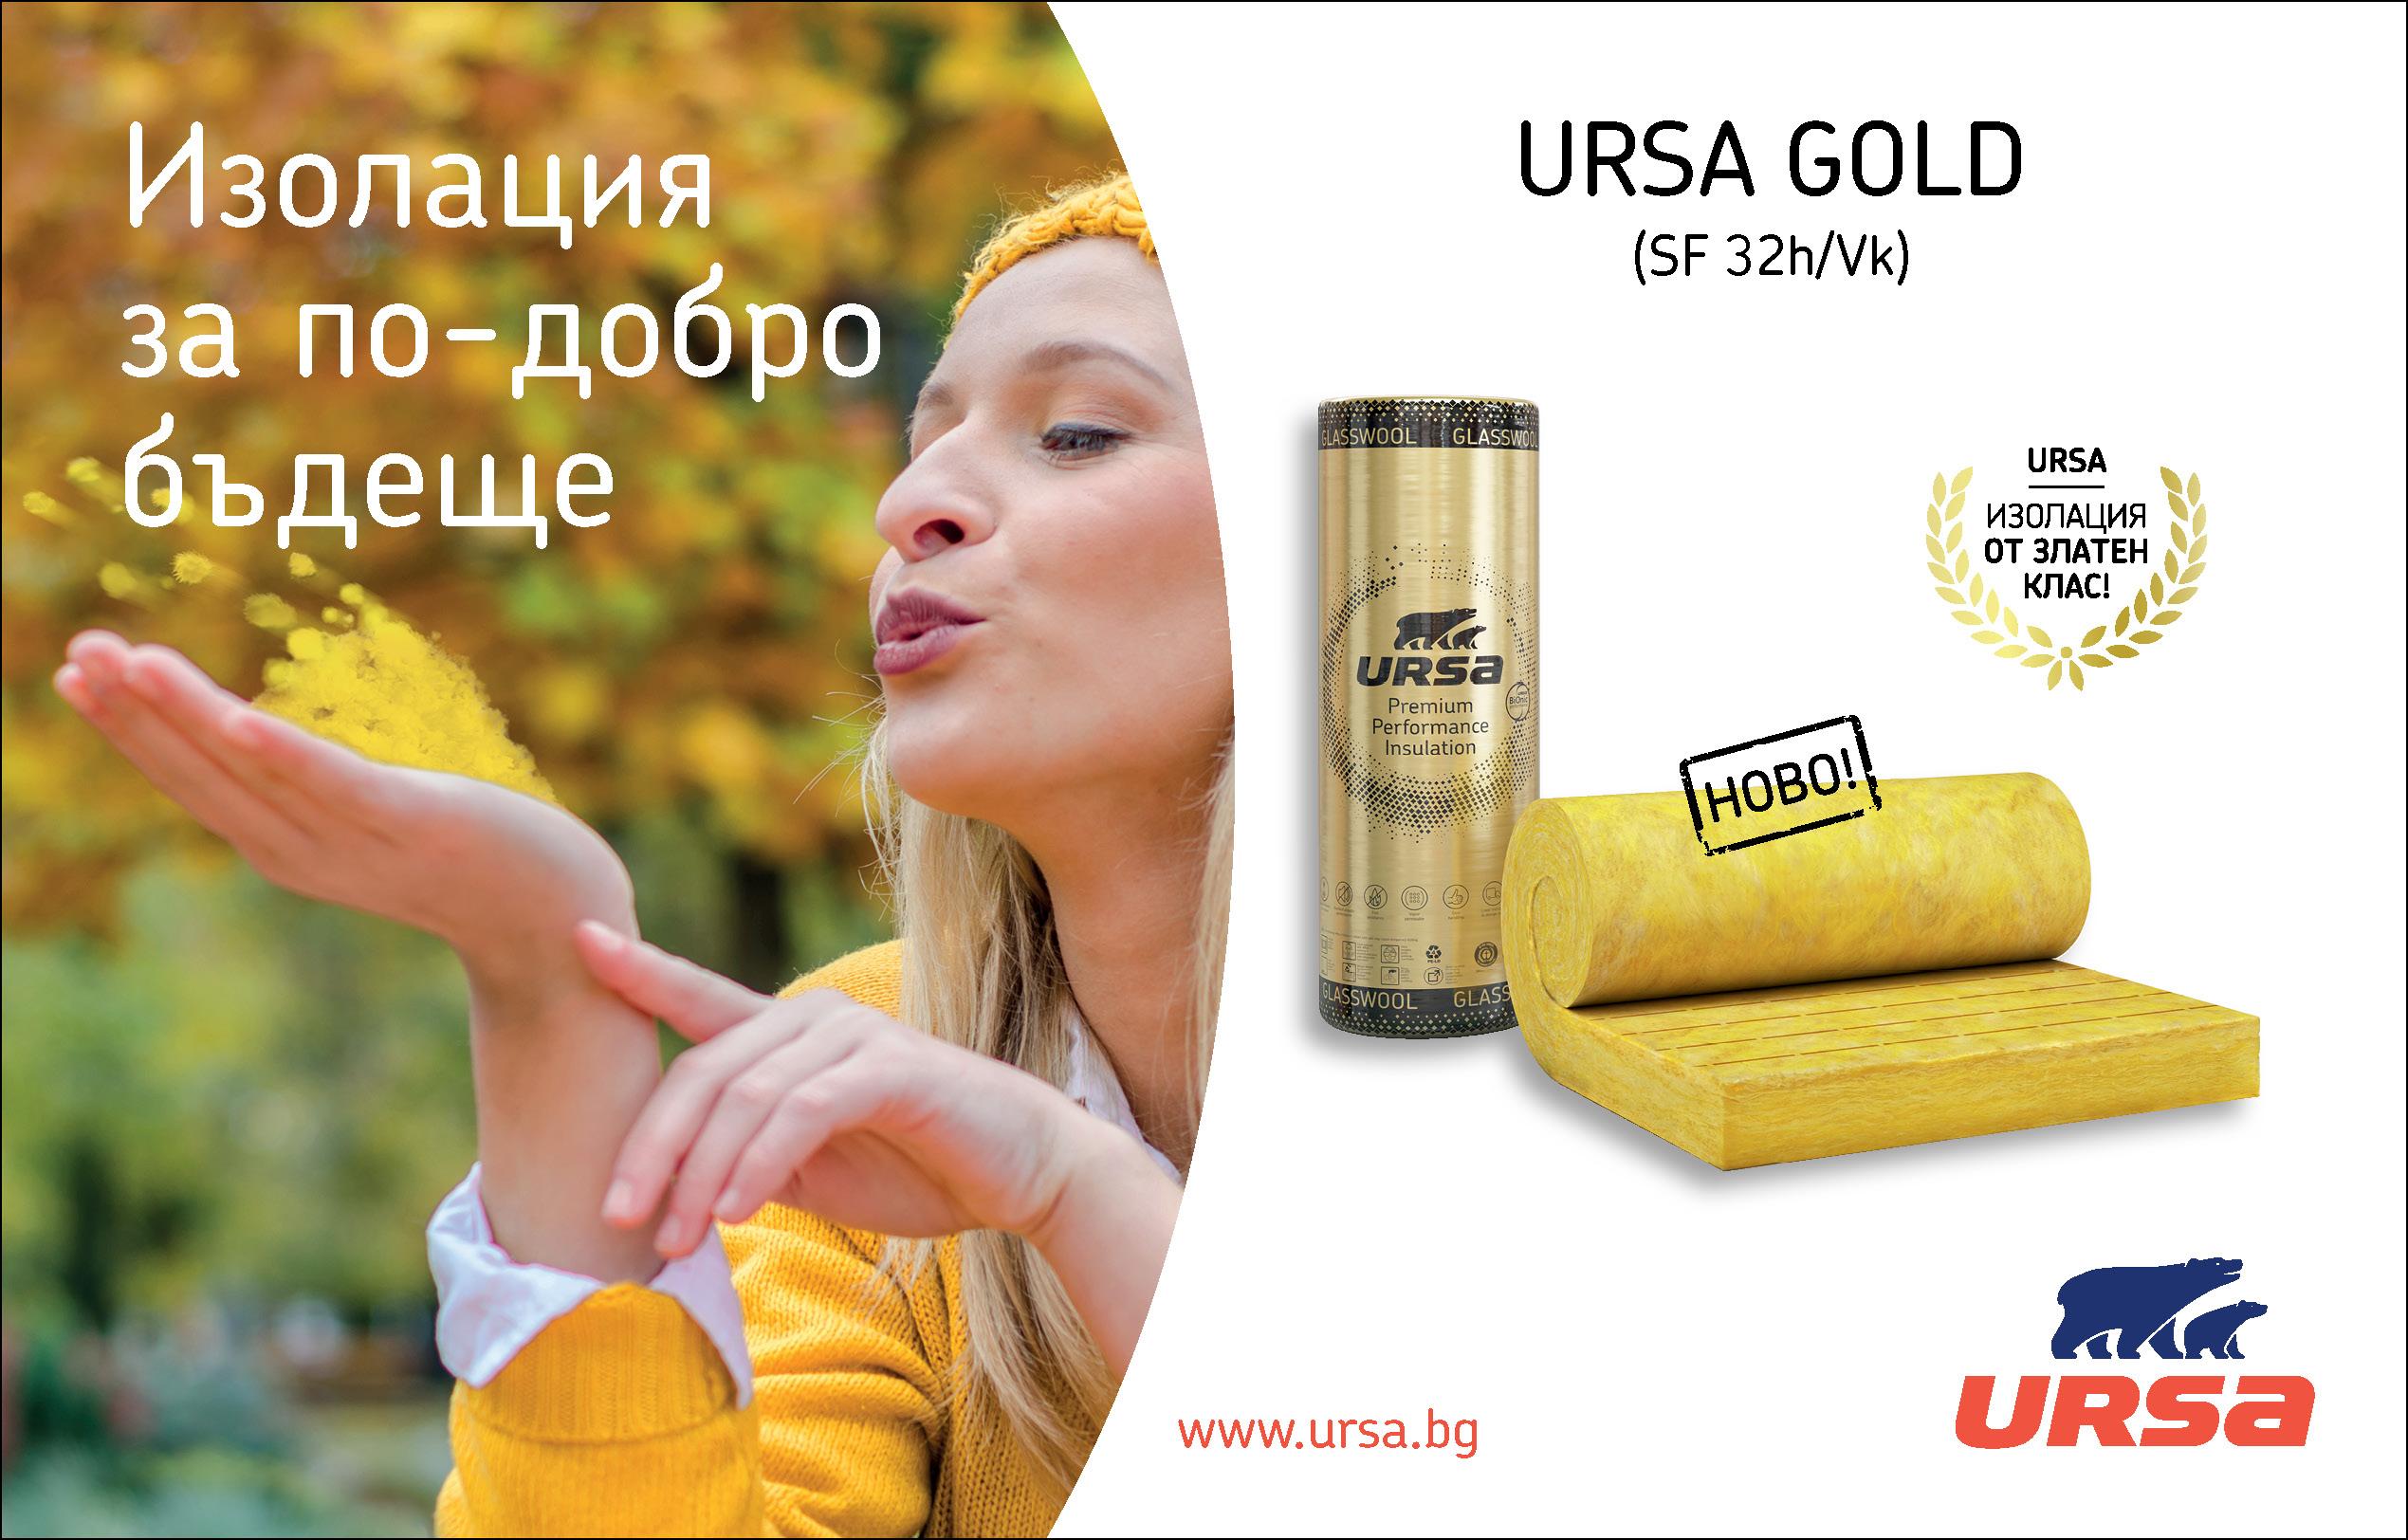 ursa-1561356962.jpg